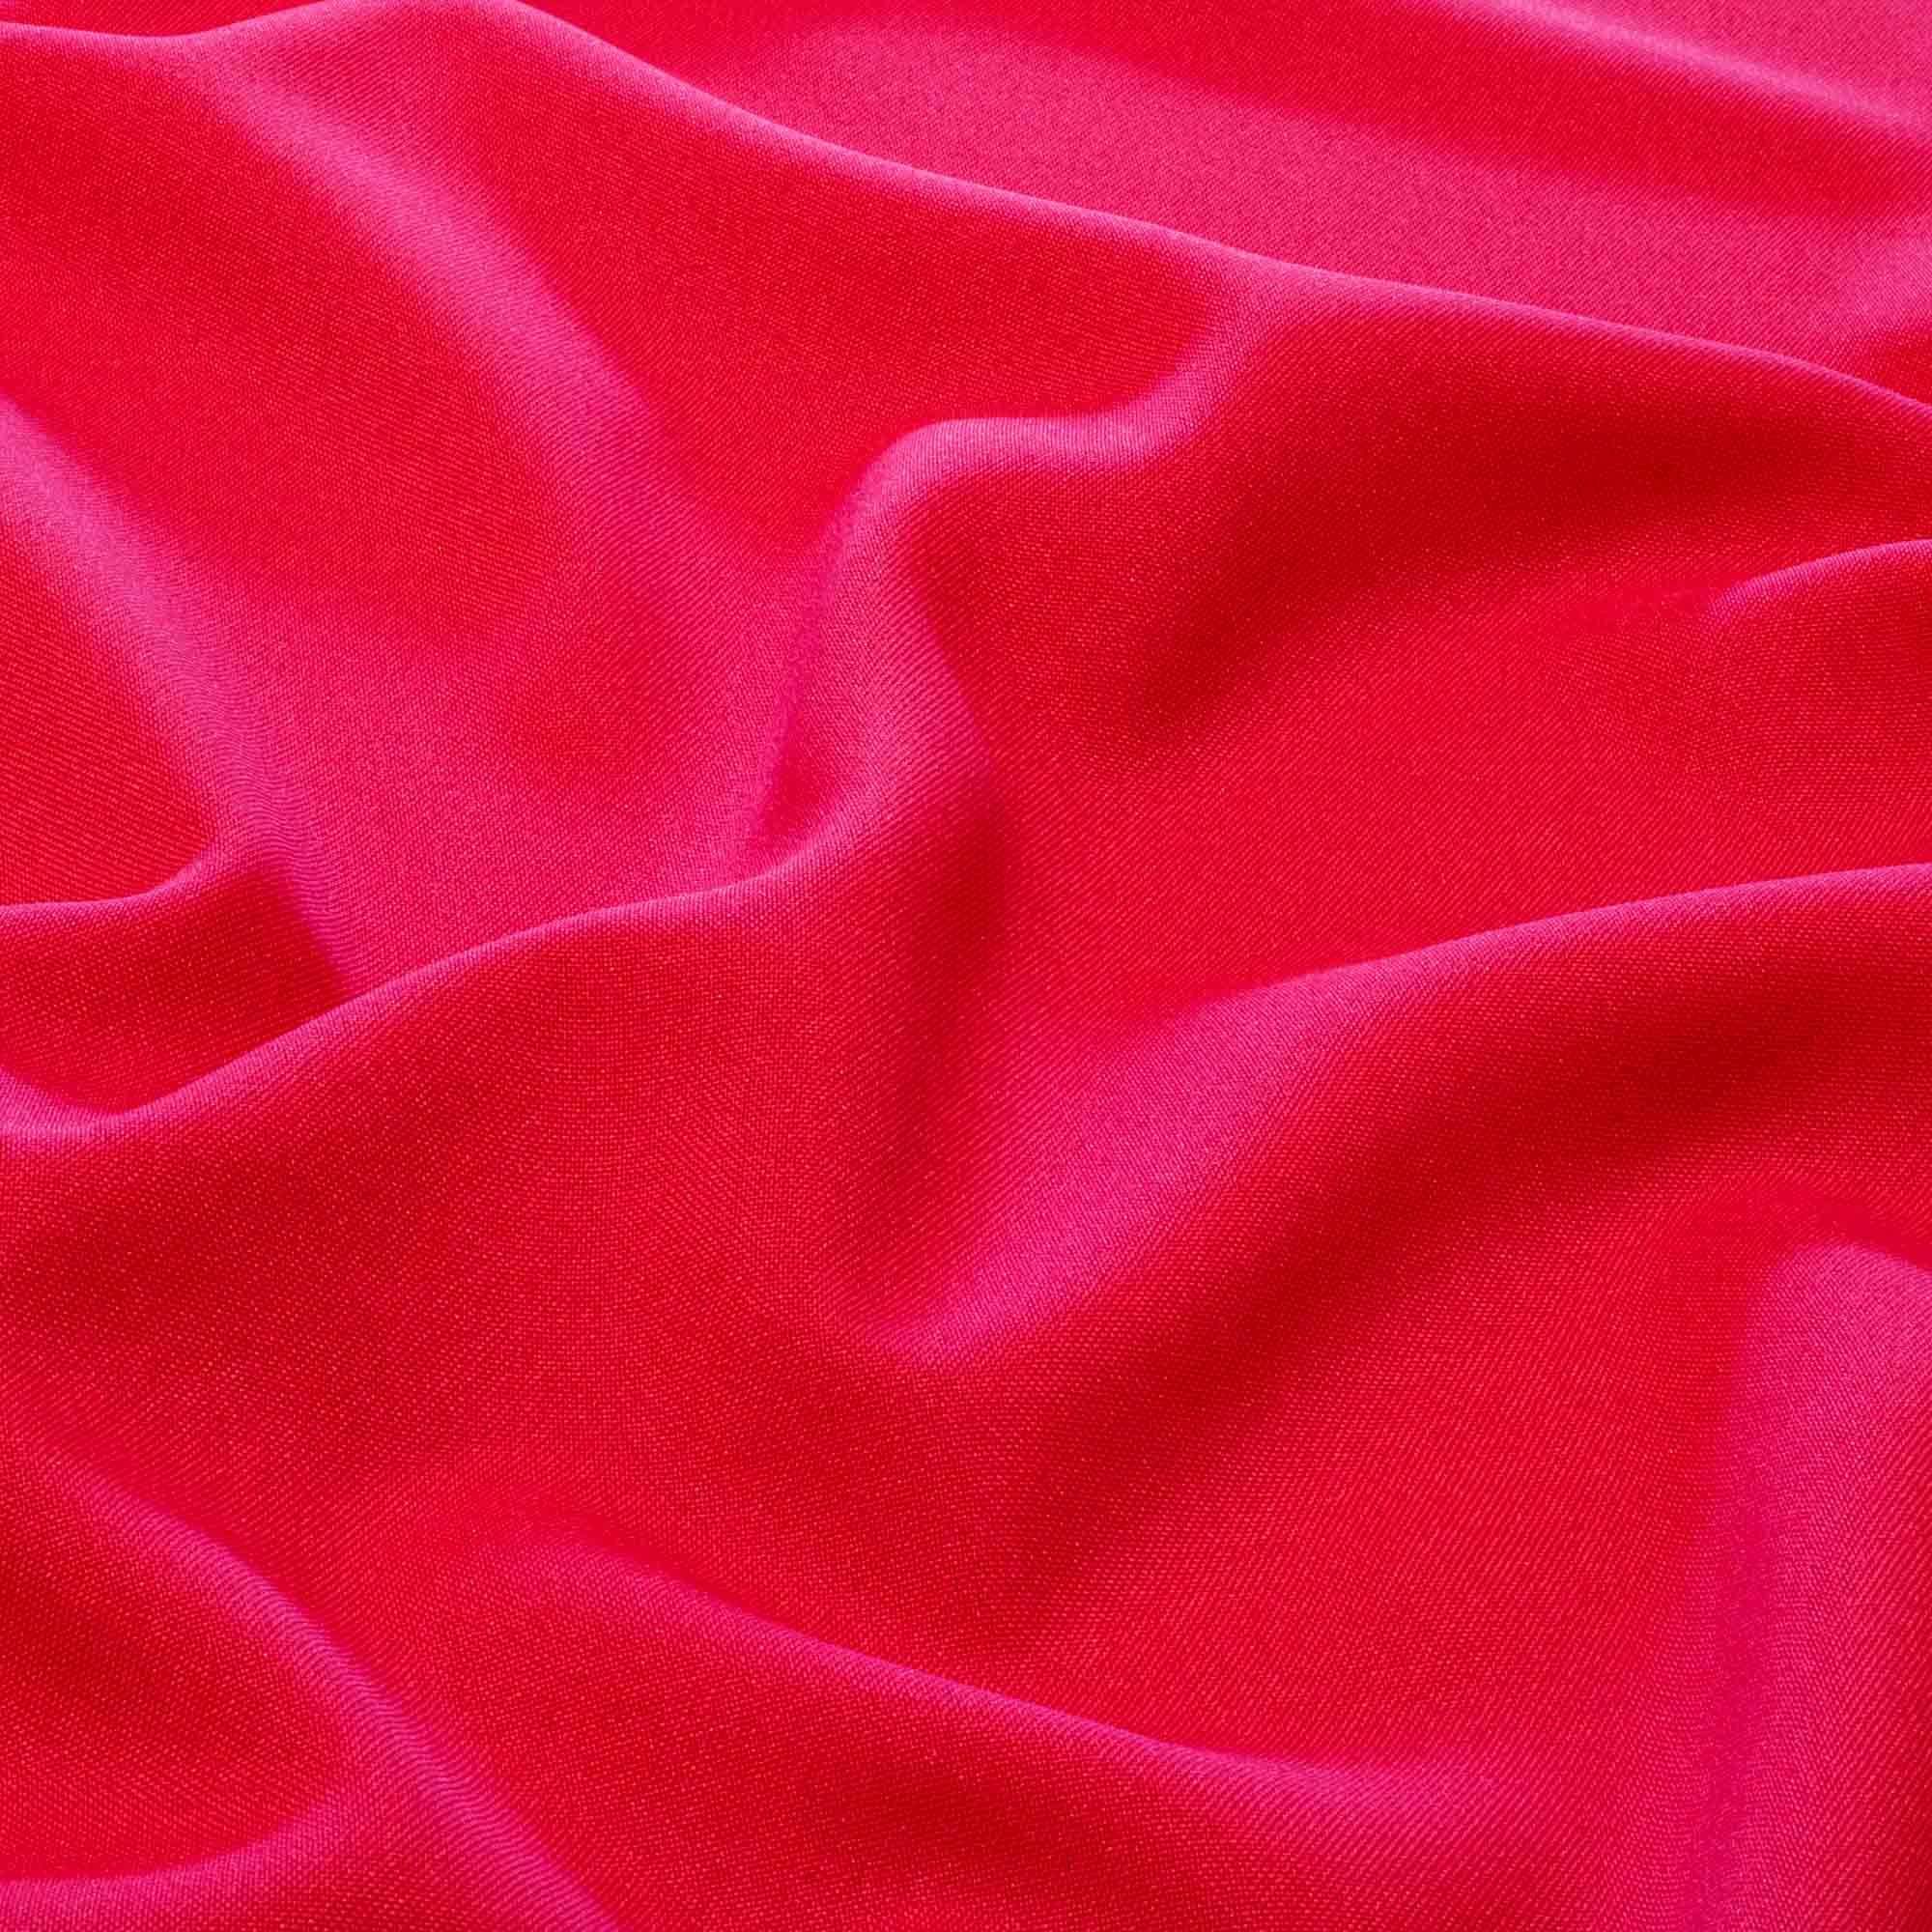 Tecido Oxford Liso 100% Poliester 1,50 m Largura Rosa Pink